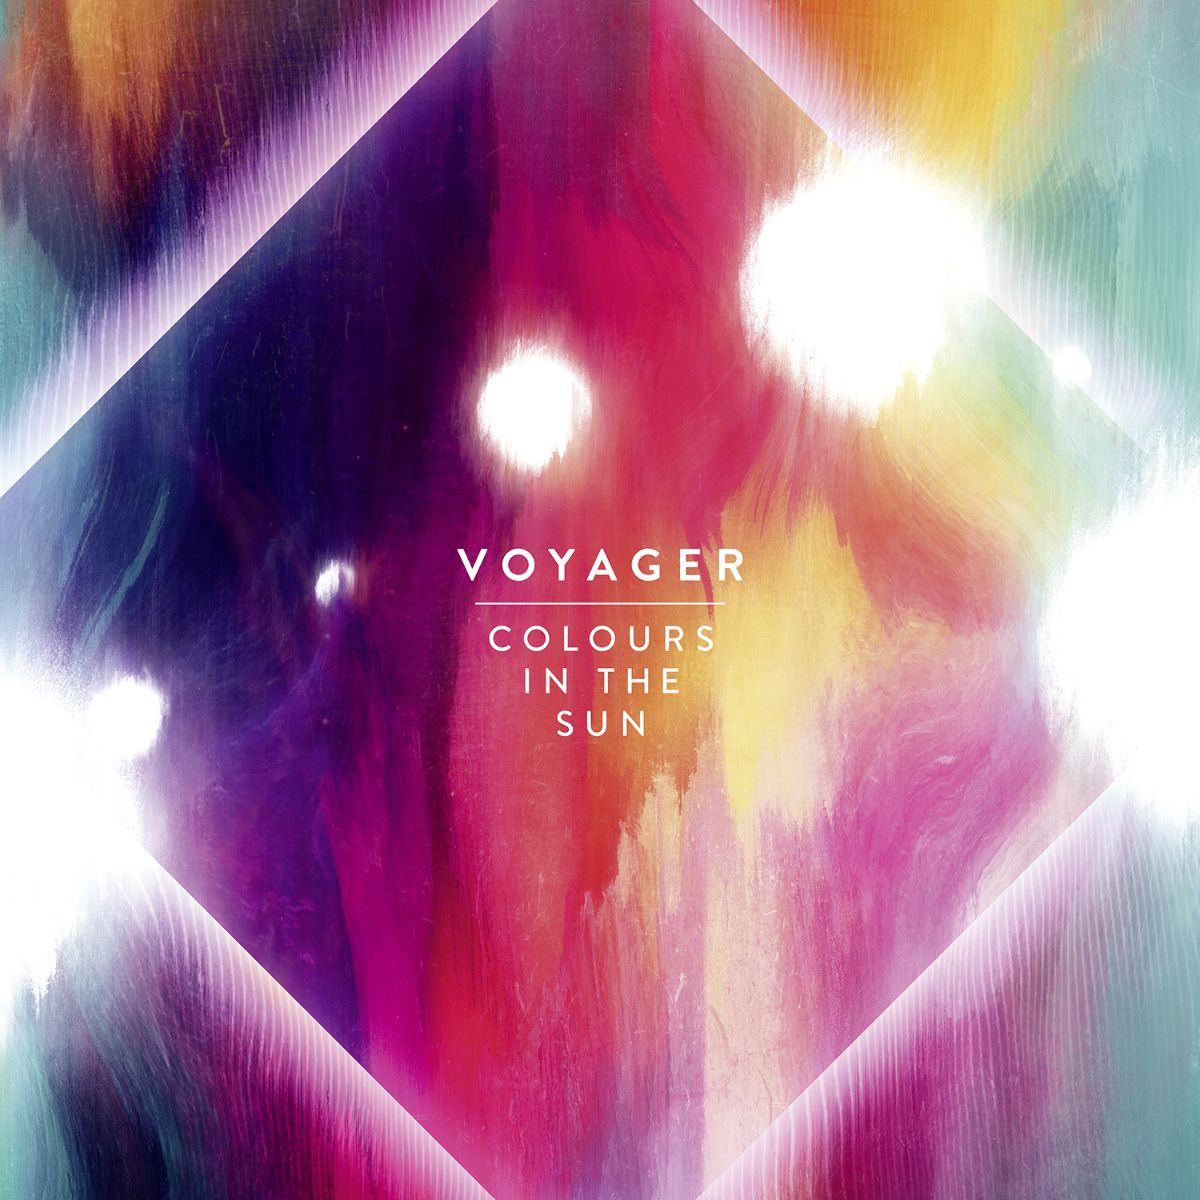 Voyager-coverartwork-CitS